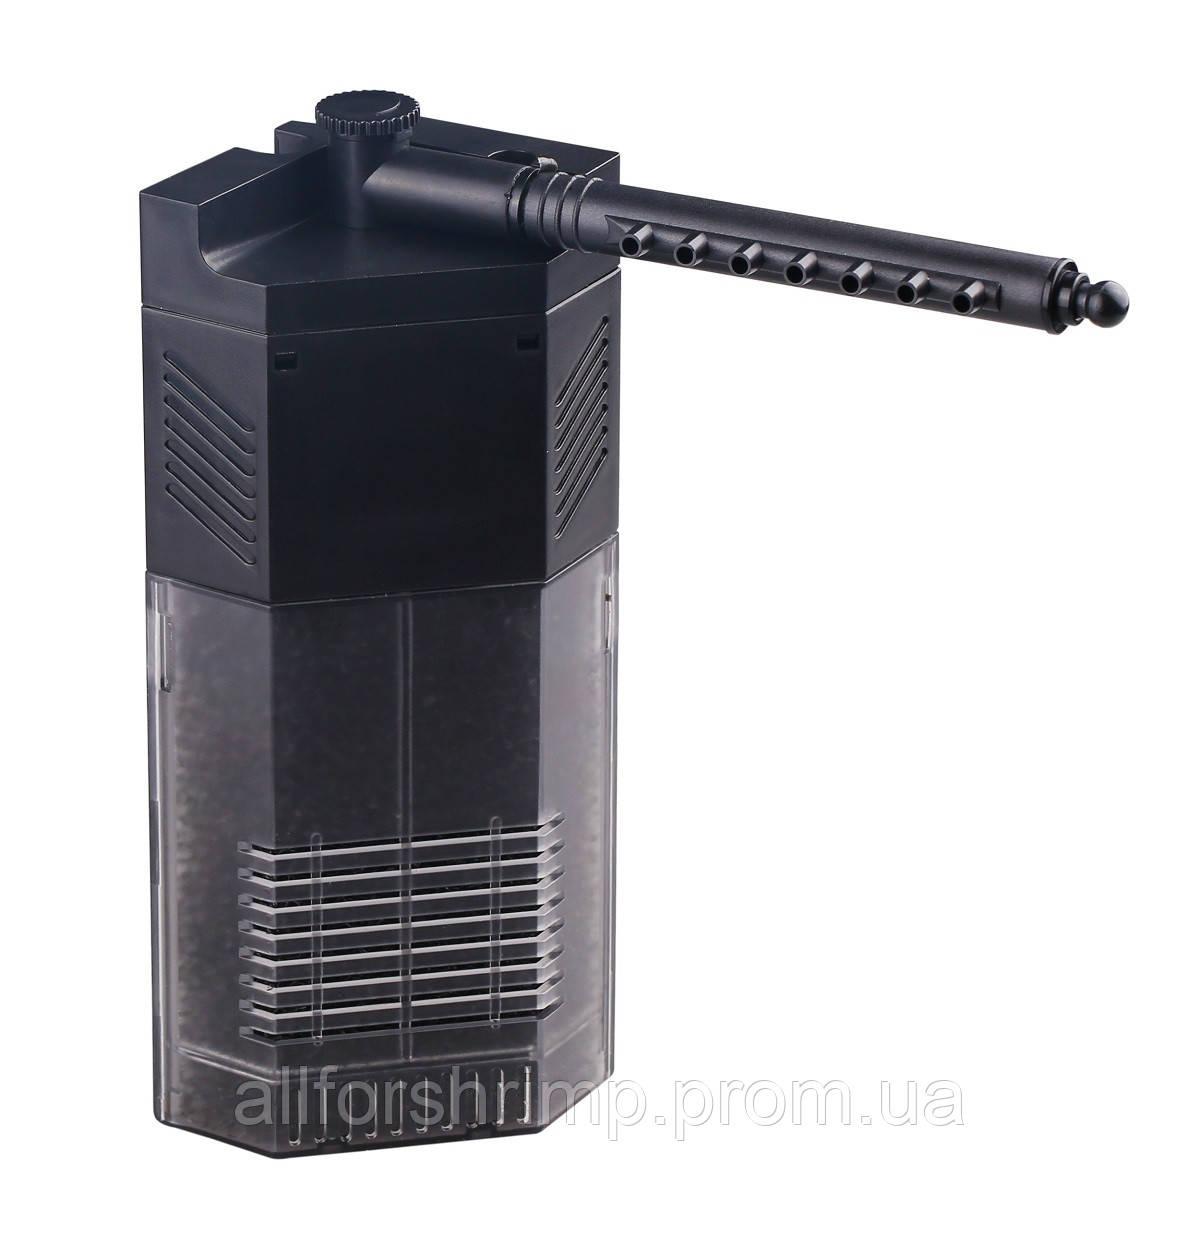 Внутренний фильтр Sunsun JP - 092